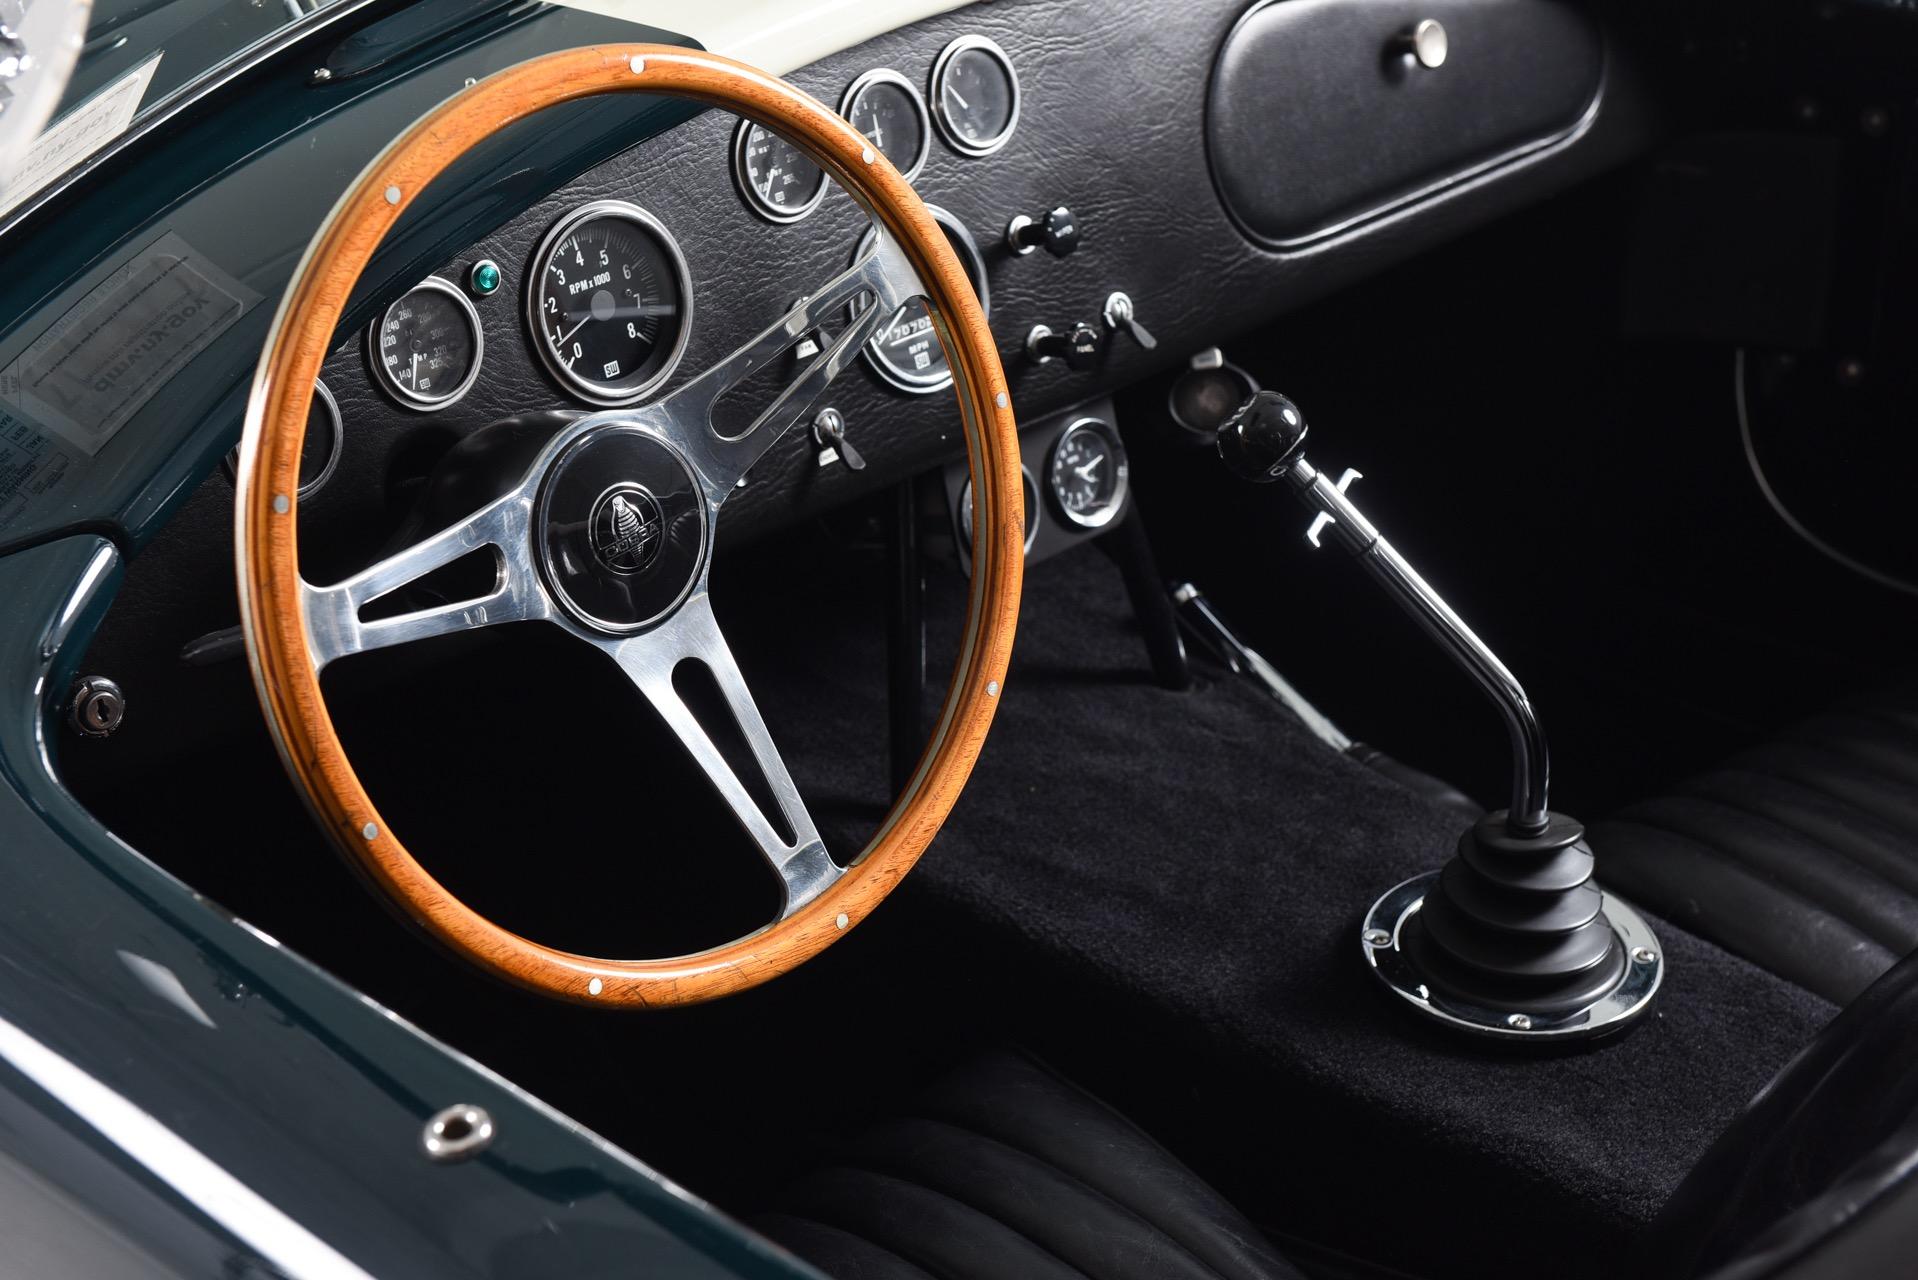 2009 Shelby Cobra